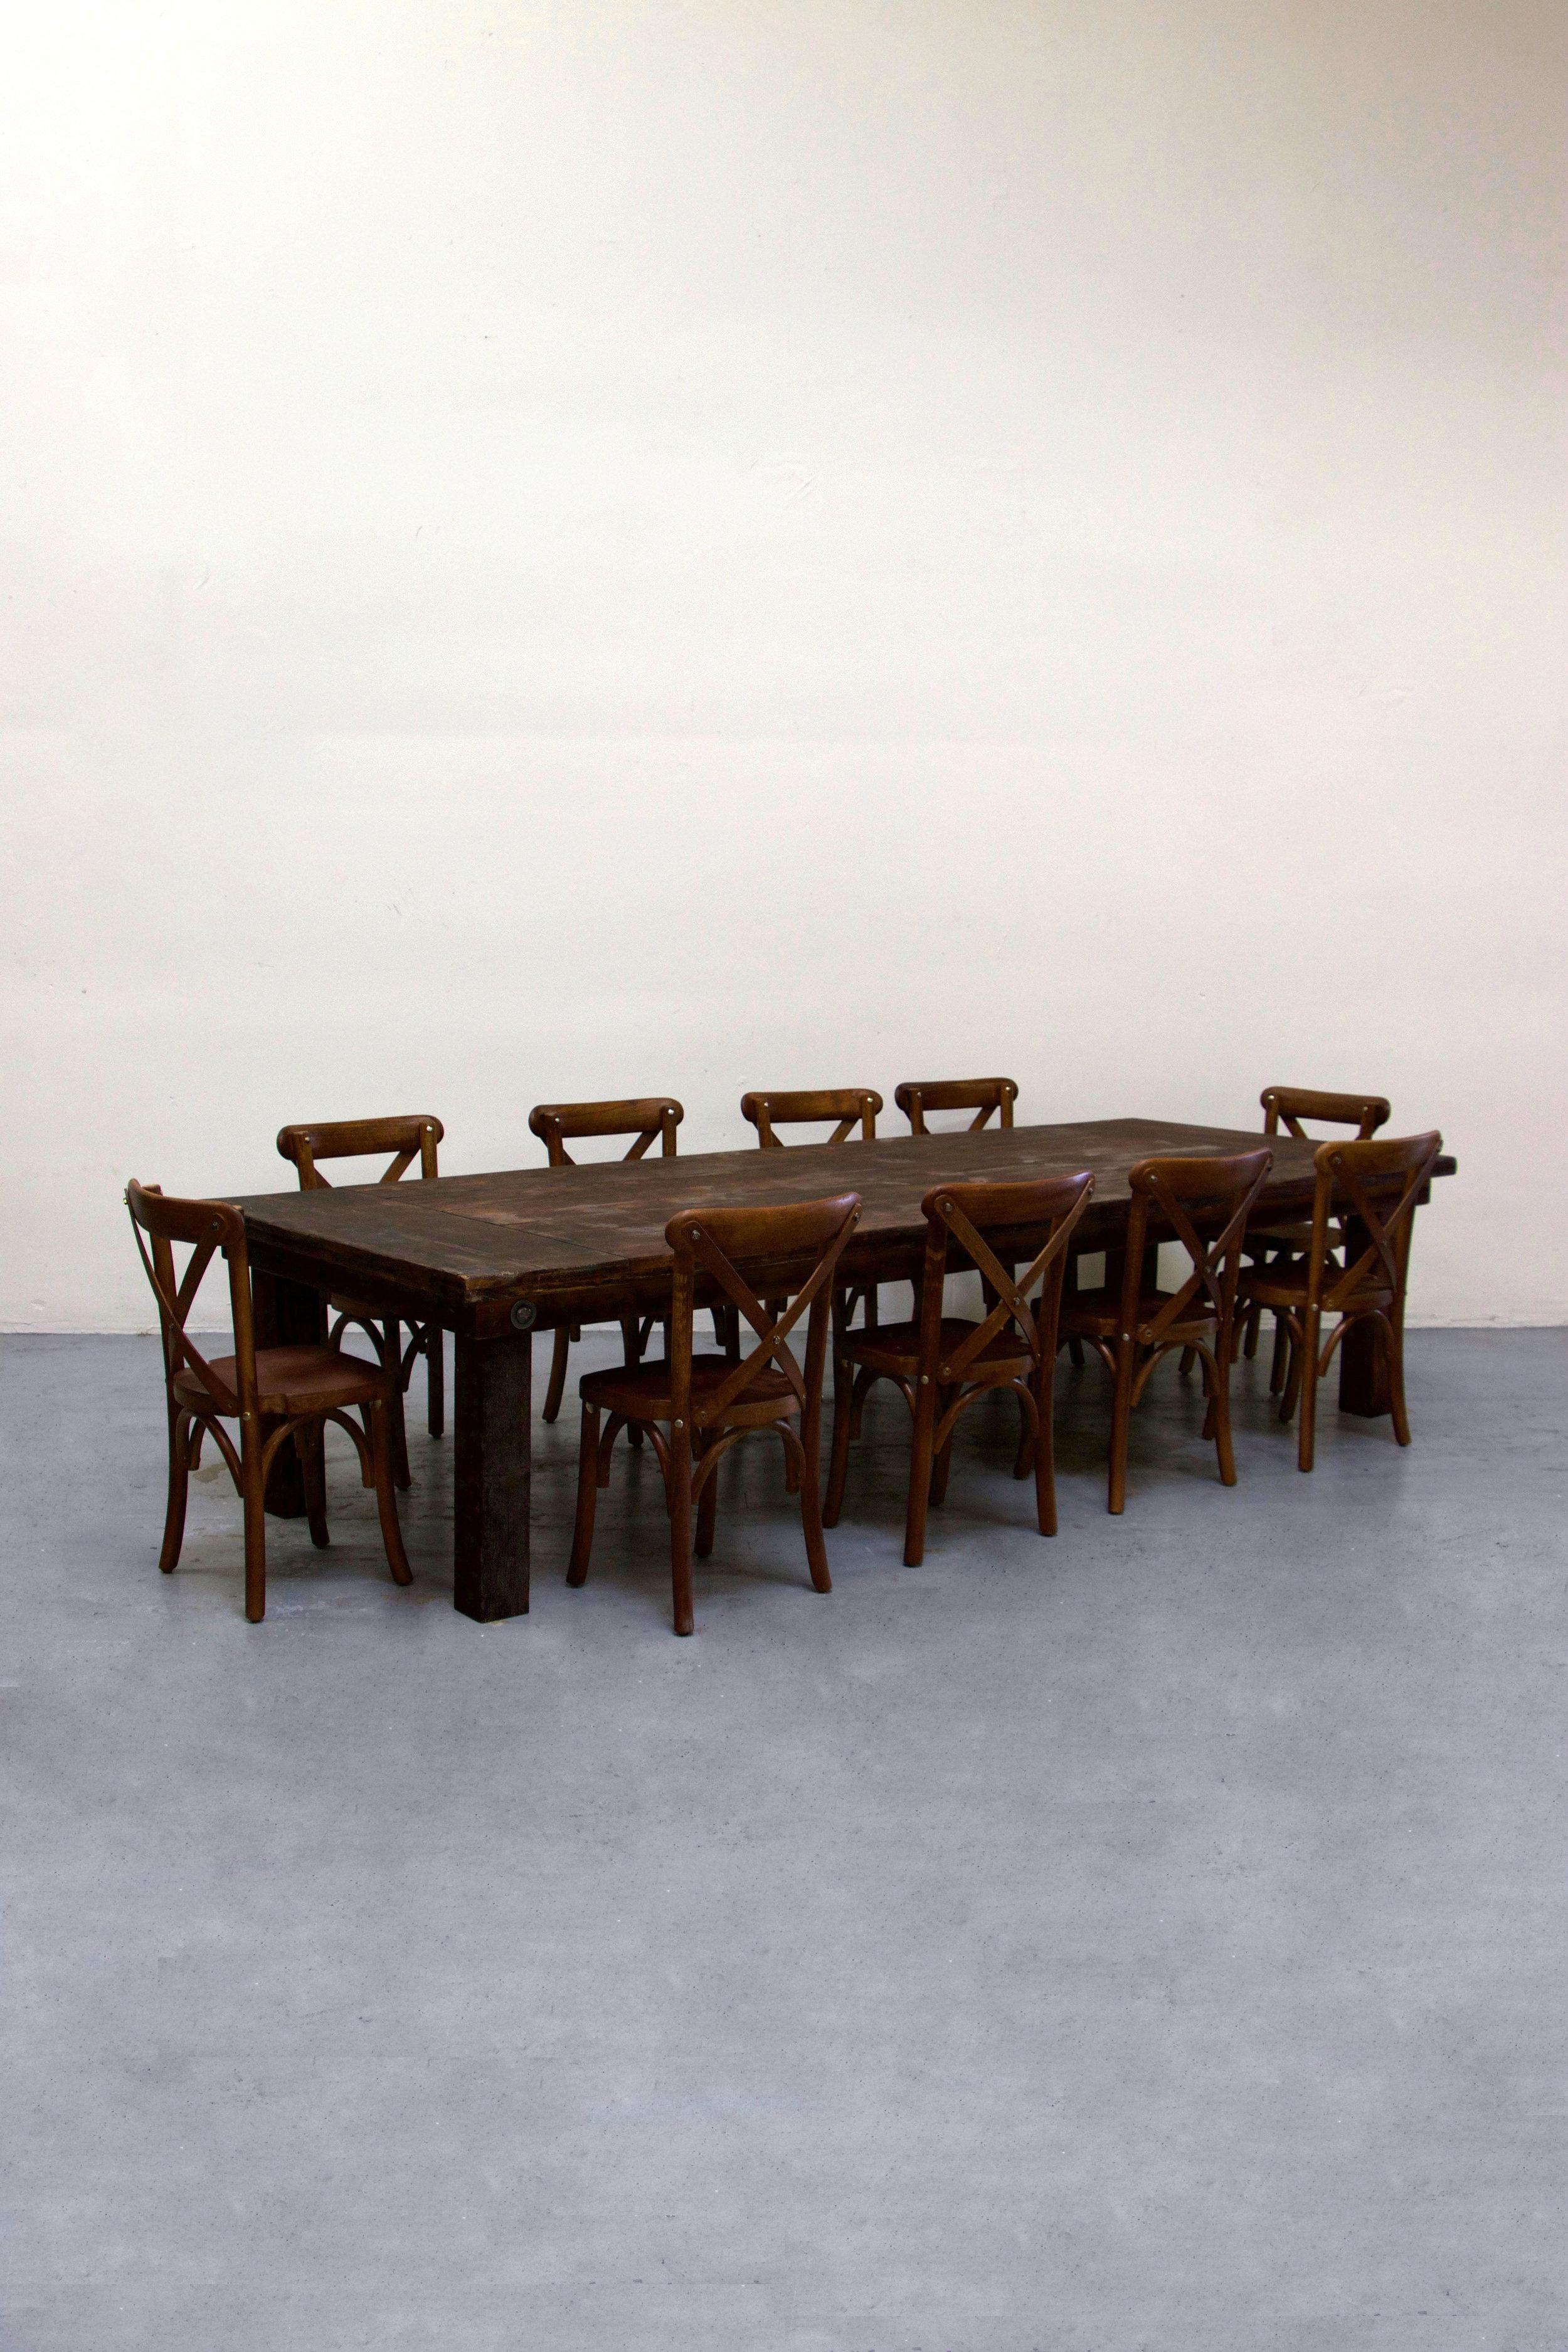 $140 1 Kids Mahogany Farm Table w/ 10 Cross-Back Chairs